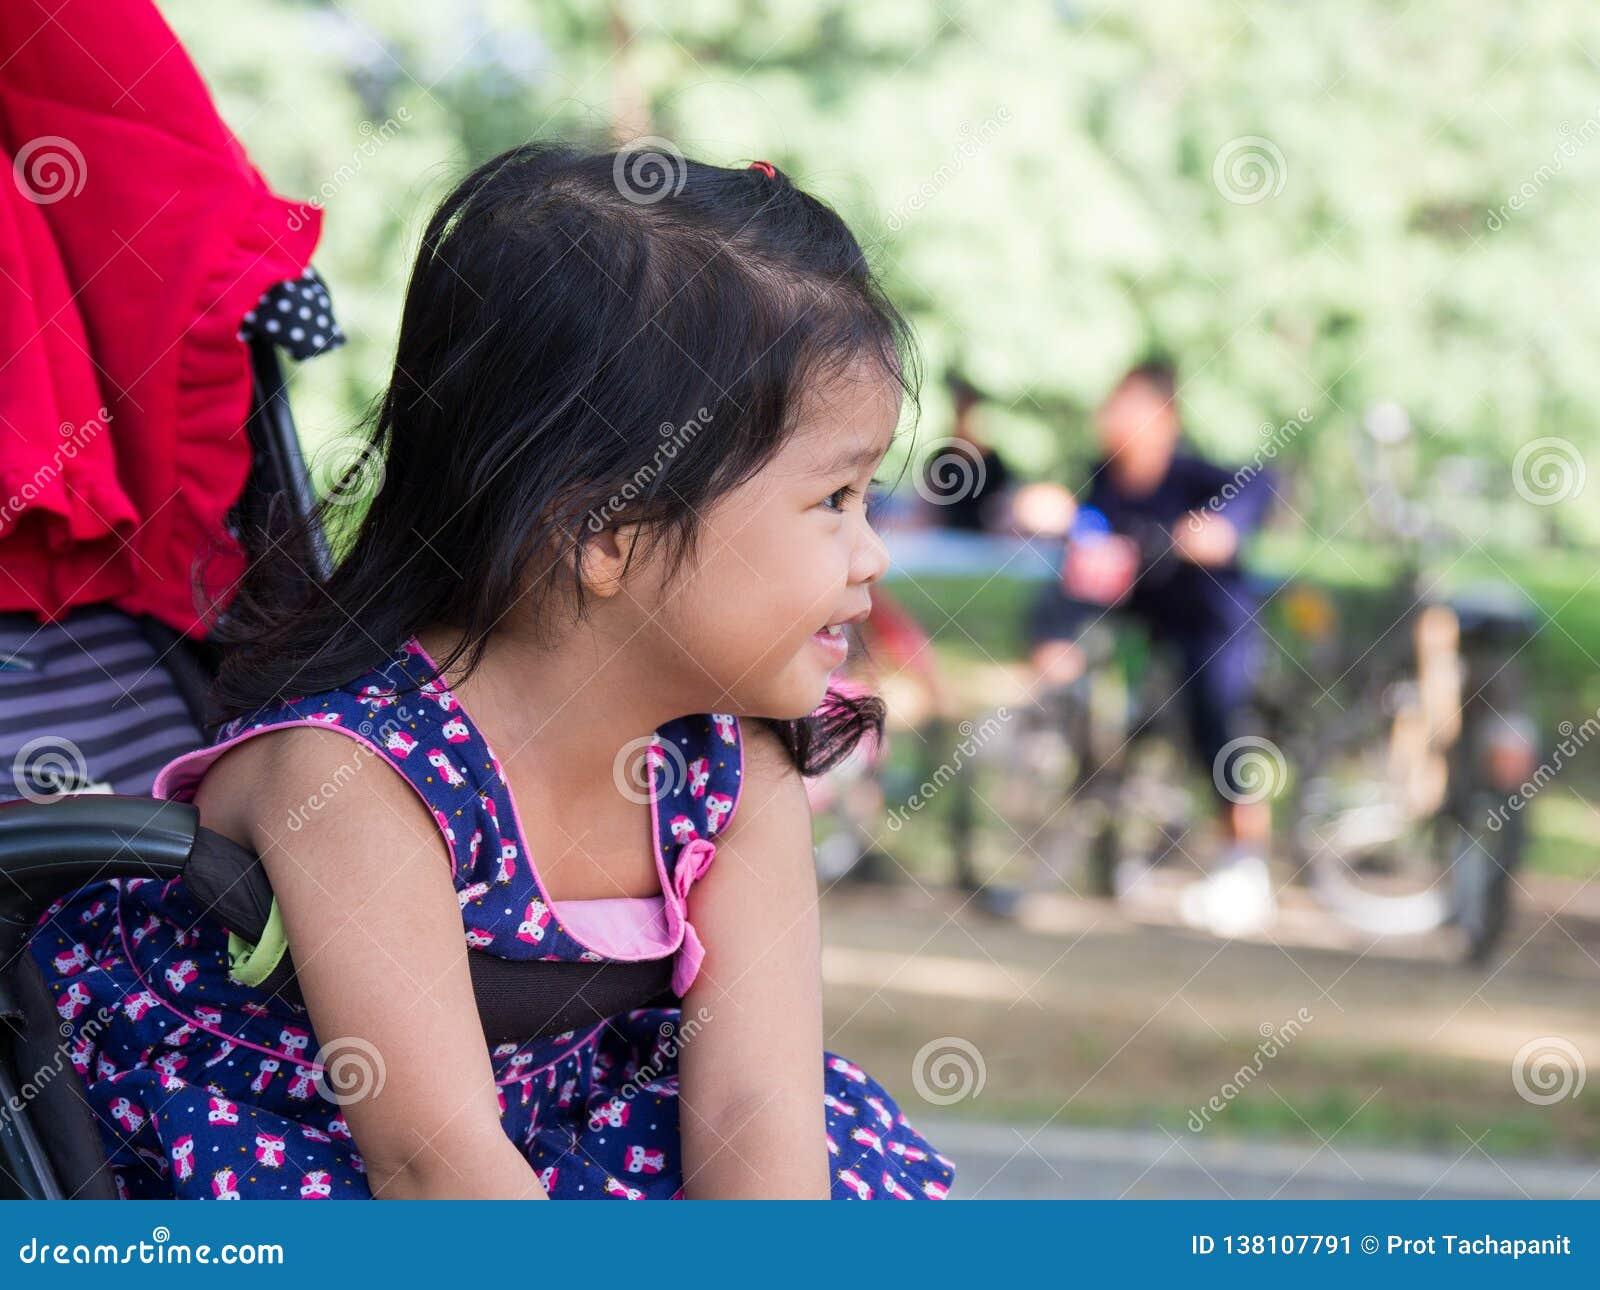 Final, Asian girls in public reserve